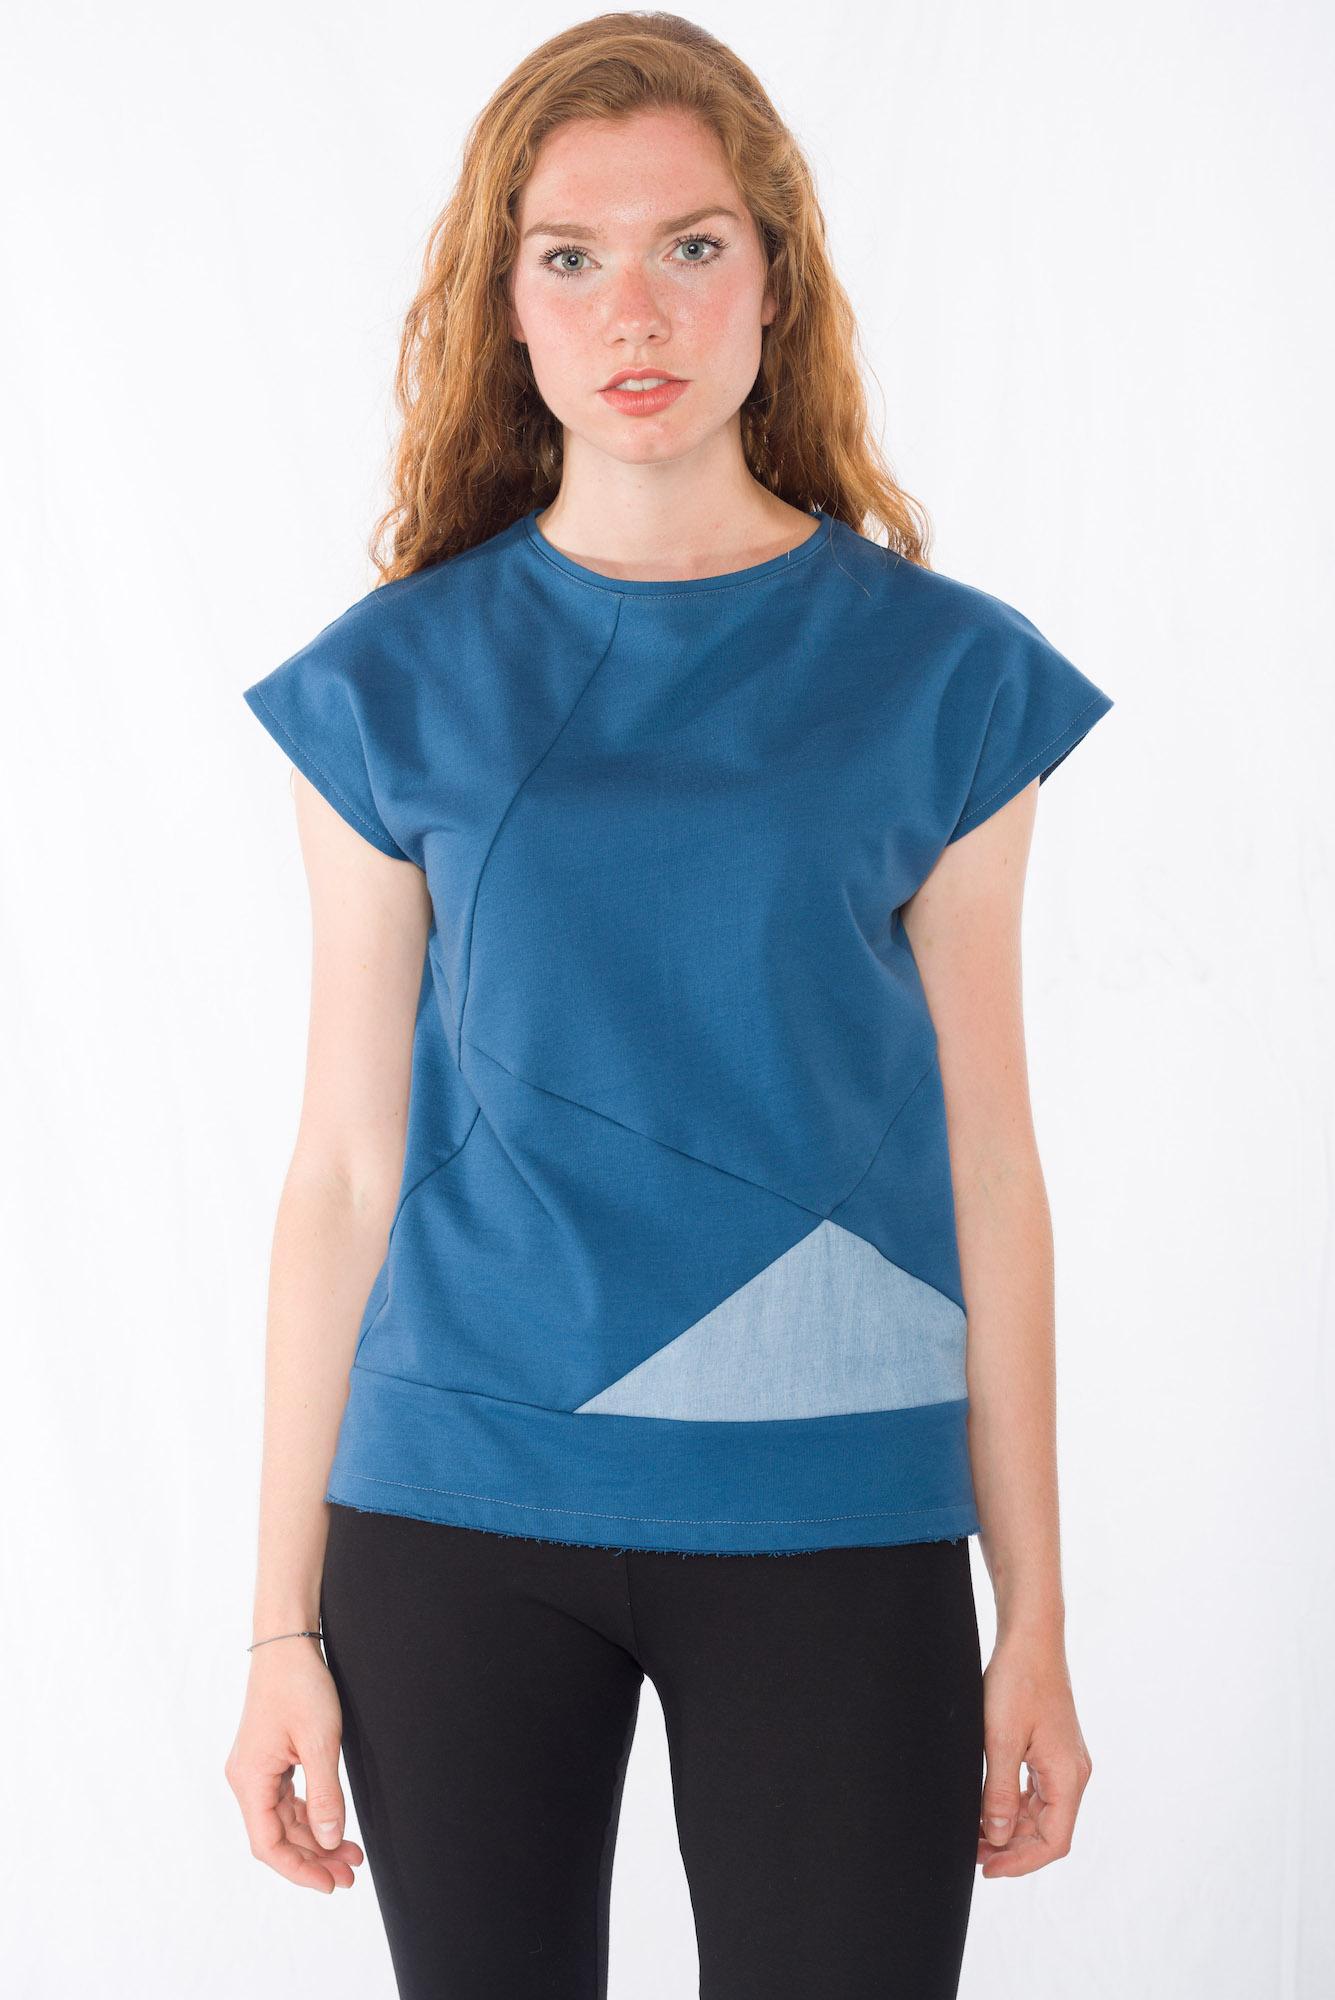 Sweat-Tshirt Blueduo